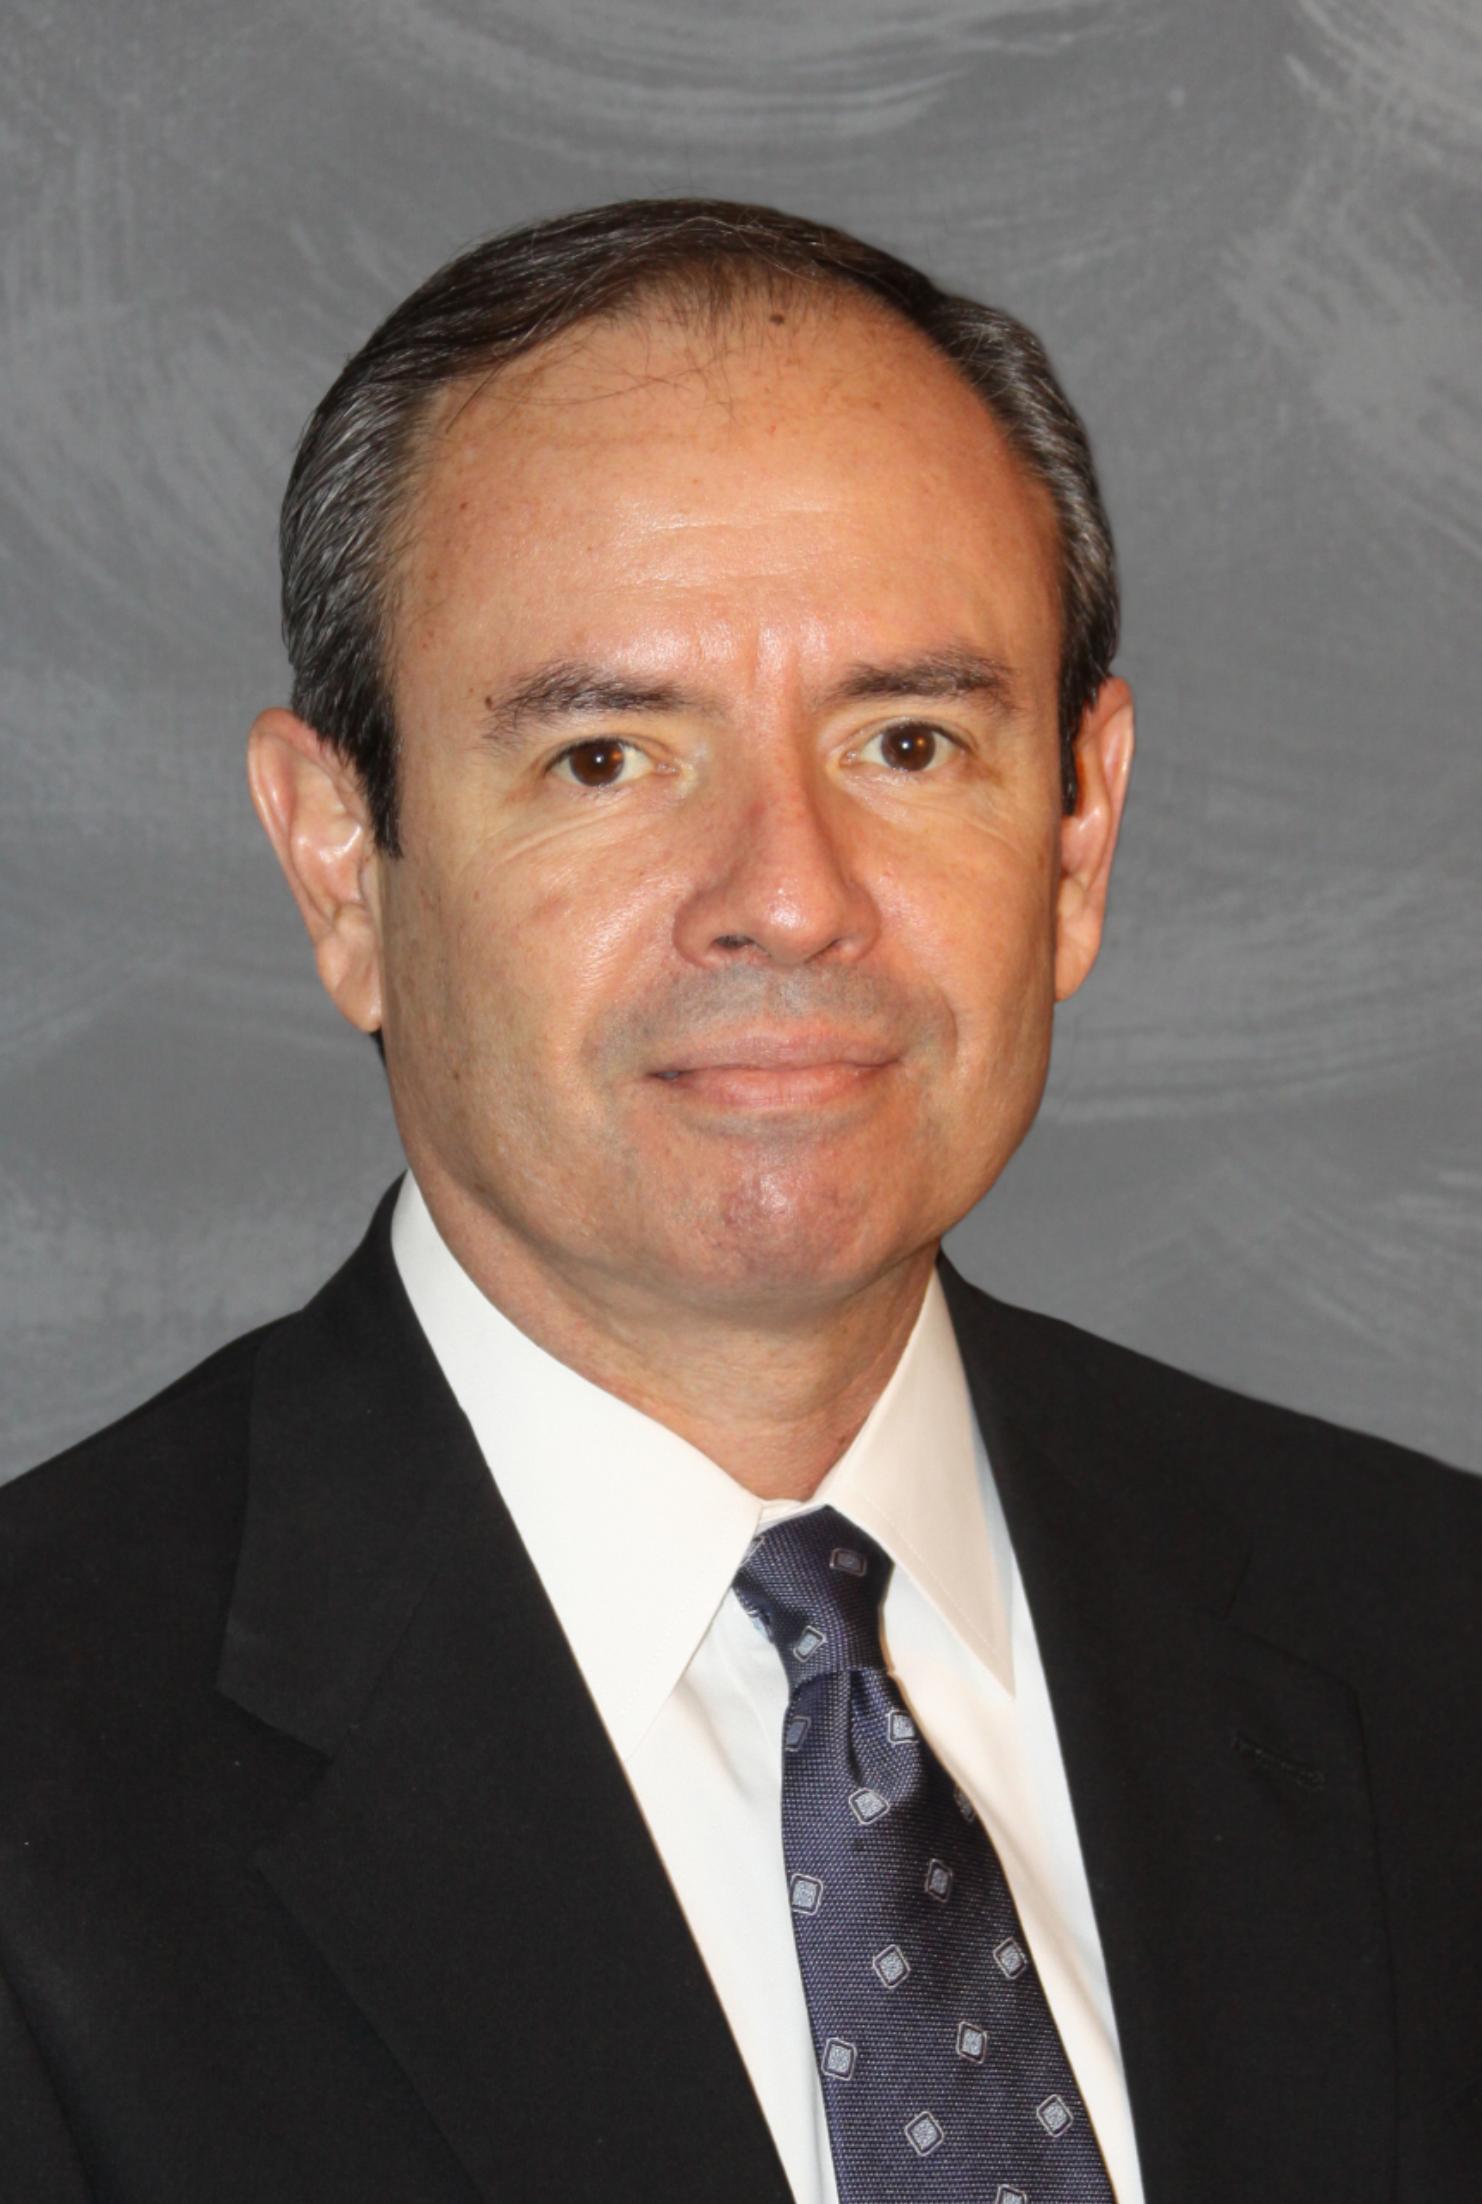 Dr. Gonzalez-Ayala